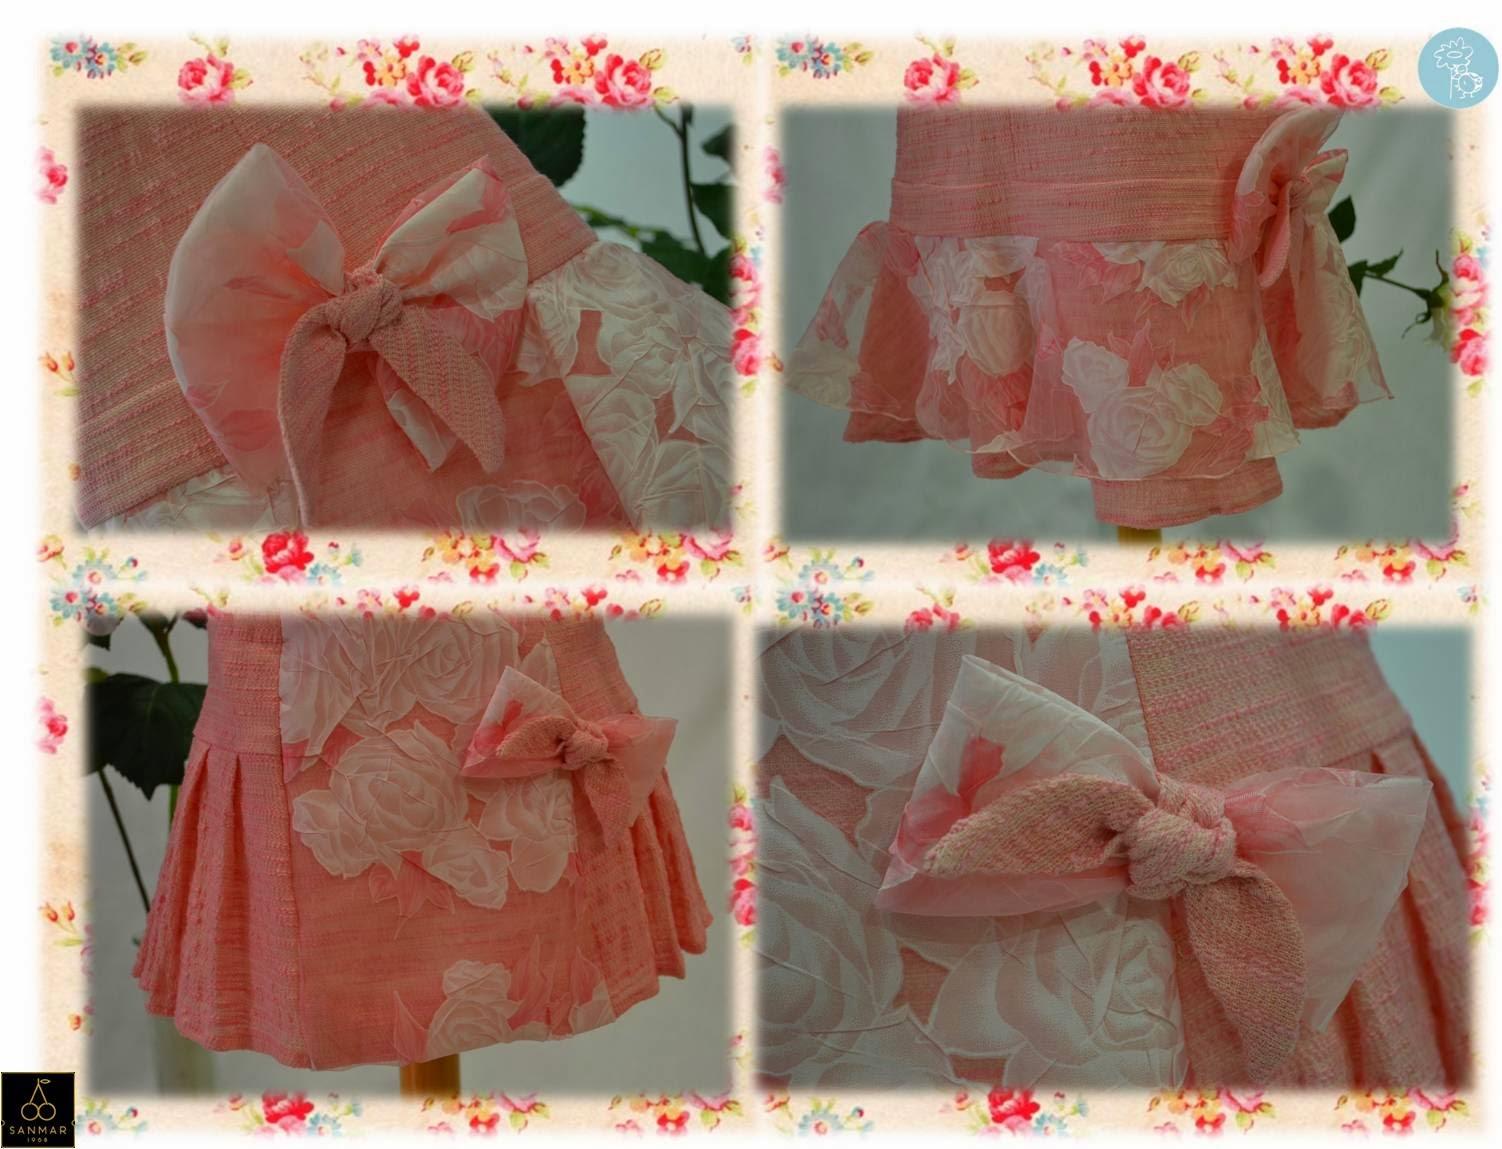 Sanmar -Detalles vestidos colección flores-